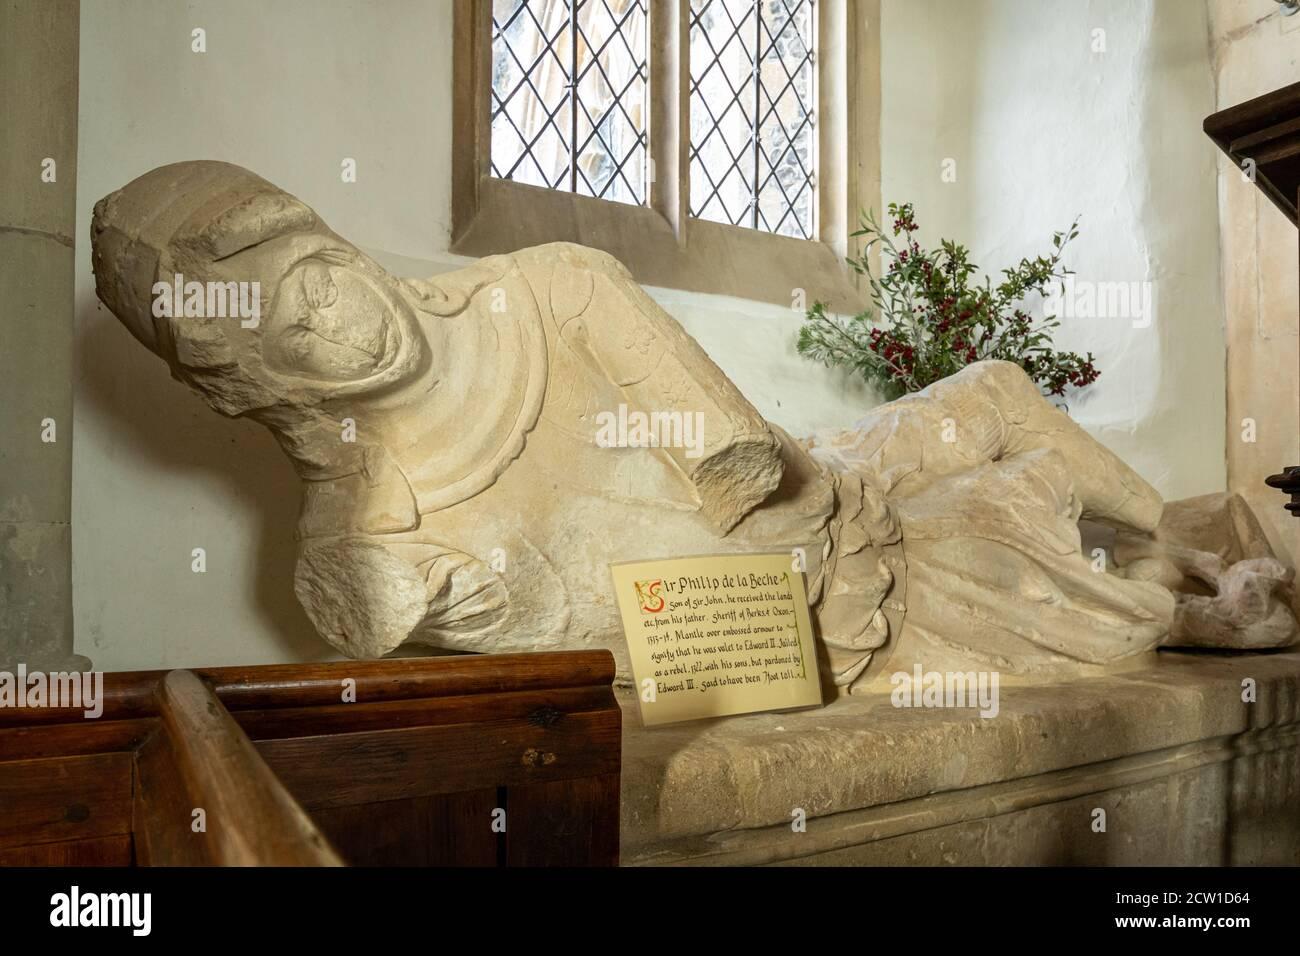 14th-century-de-la-beche-family-effigies-known-as-the-aldworth-giants-inside-st-marys-church-in-aldworth-village-berkshire-uk-2CW1D64.jpg